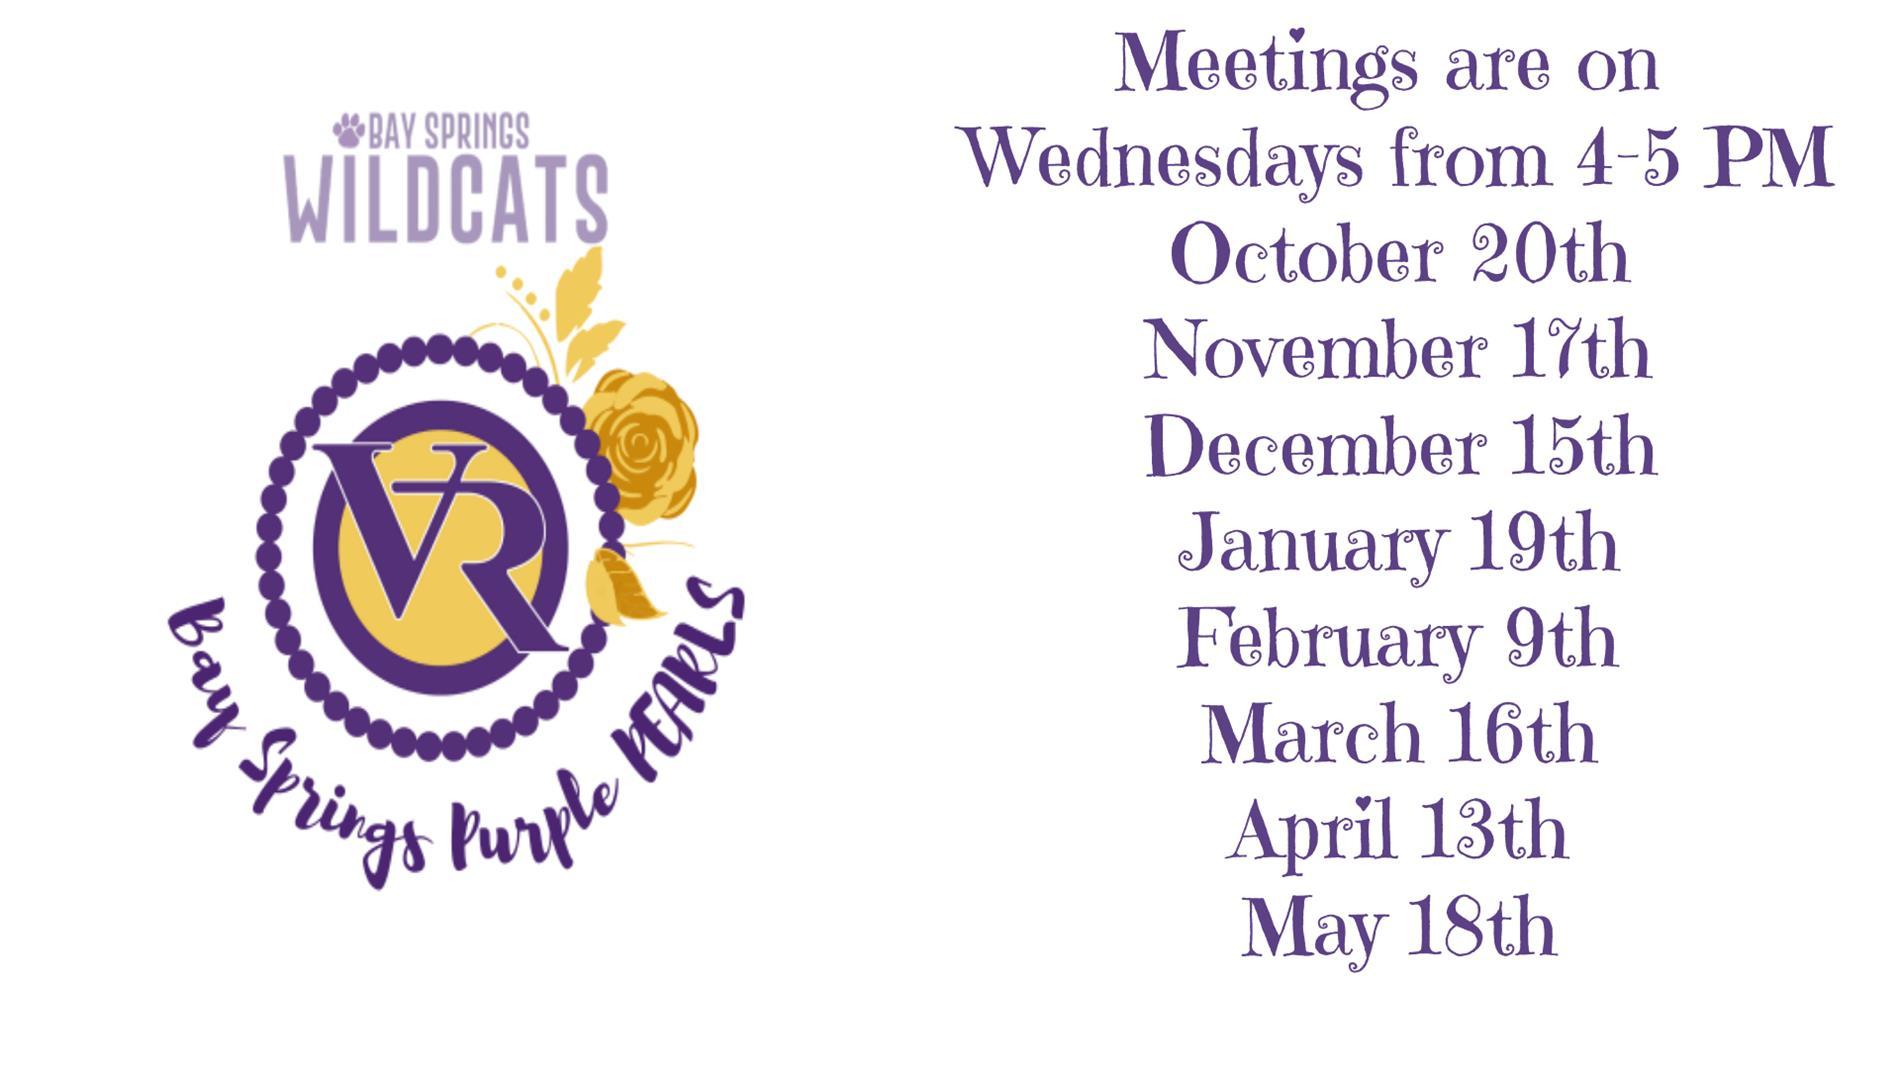 PEARL Meeting Dates